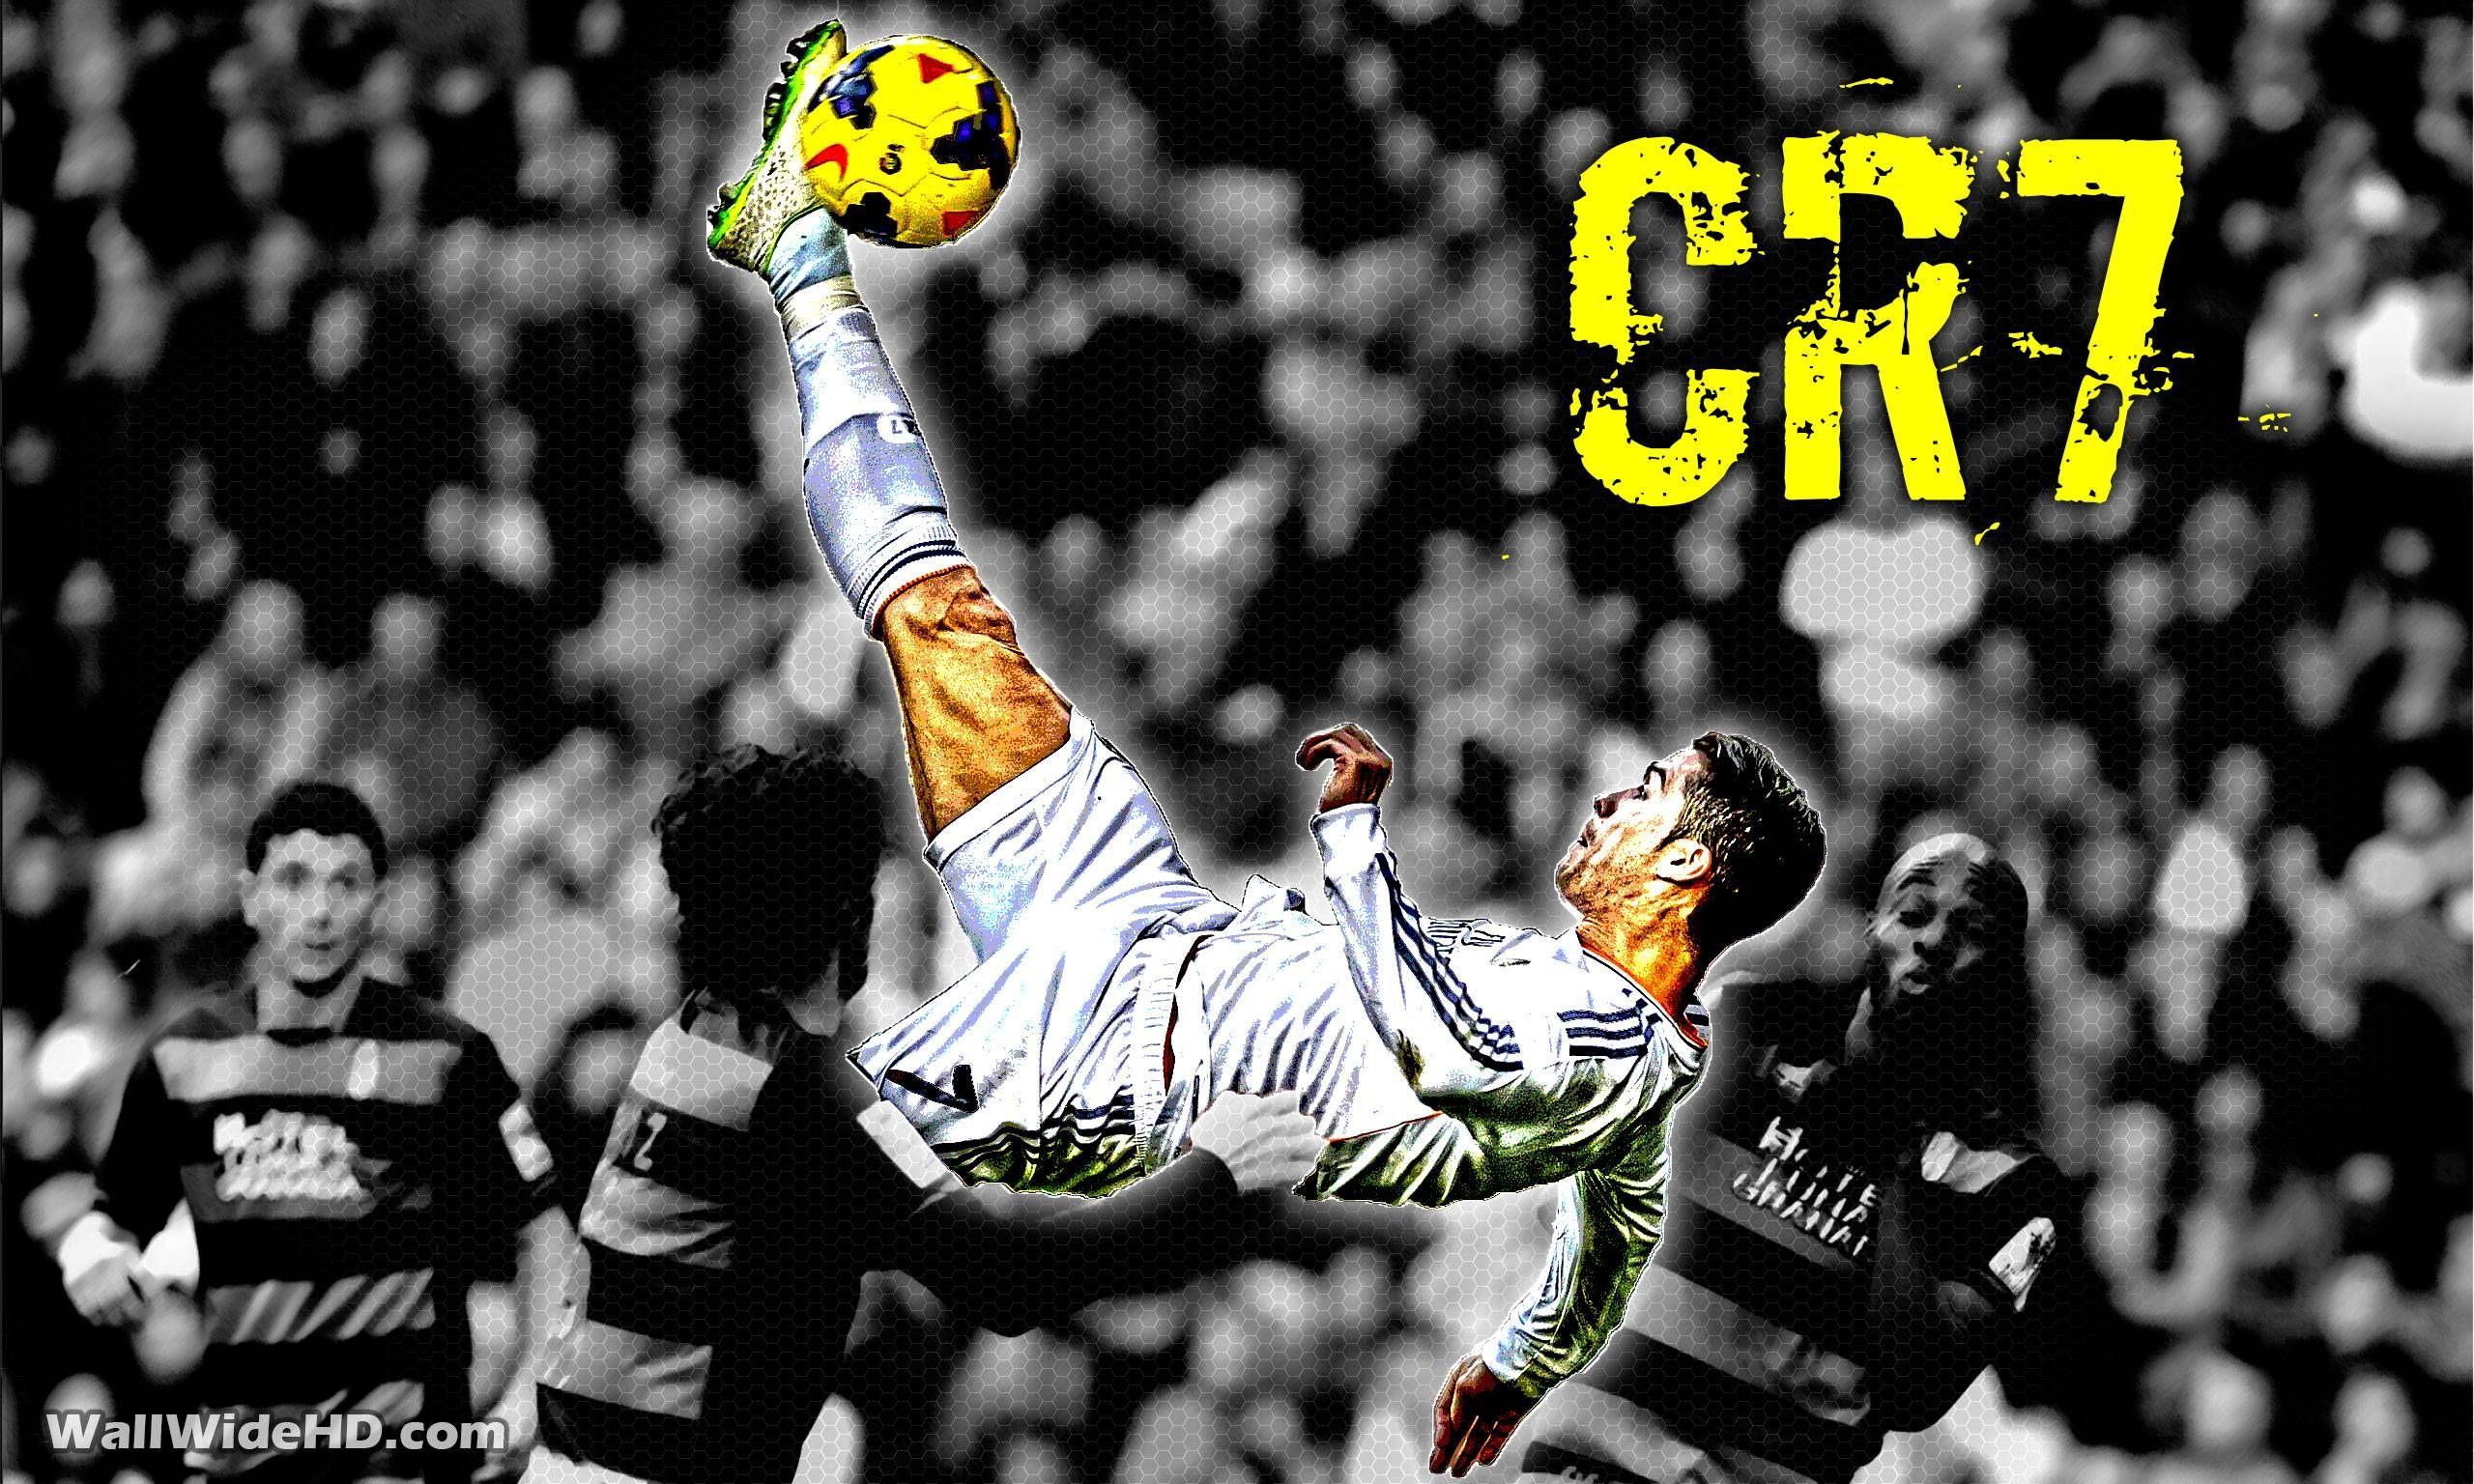 Cristiano Ronaldo Backgrounds Wallpaper | Ronaldo ...